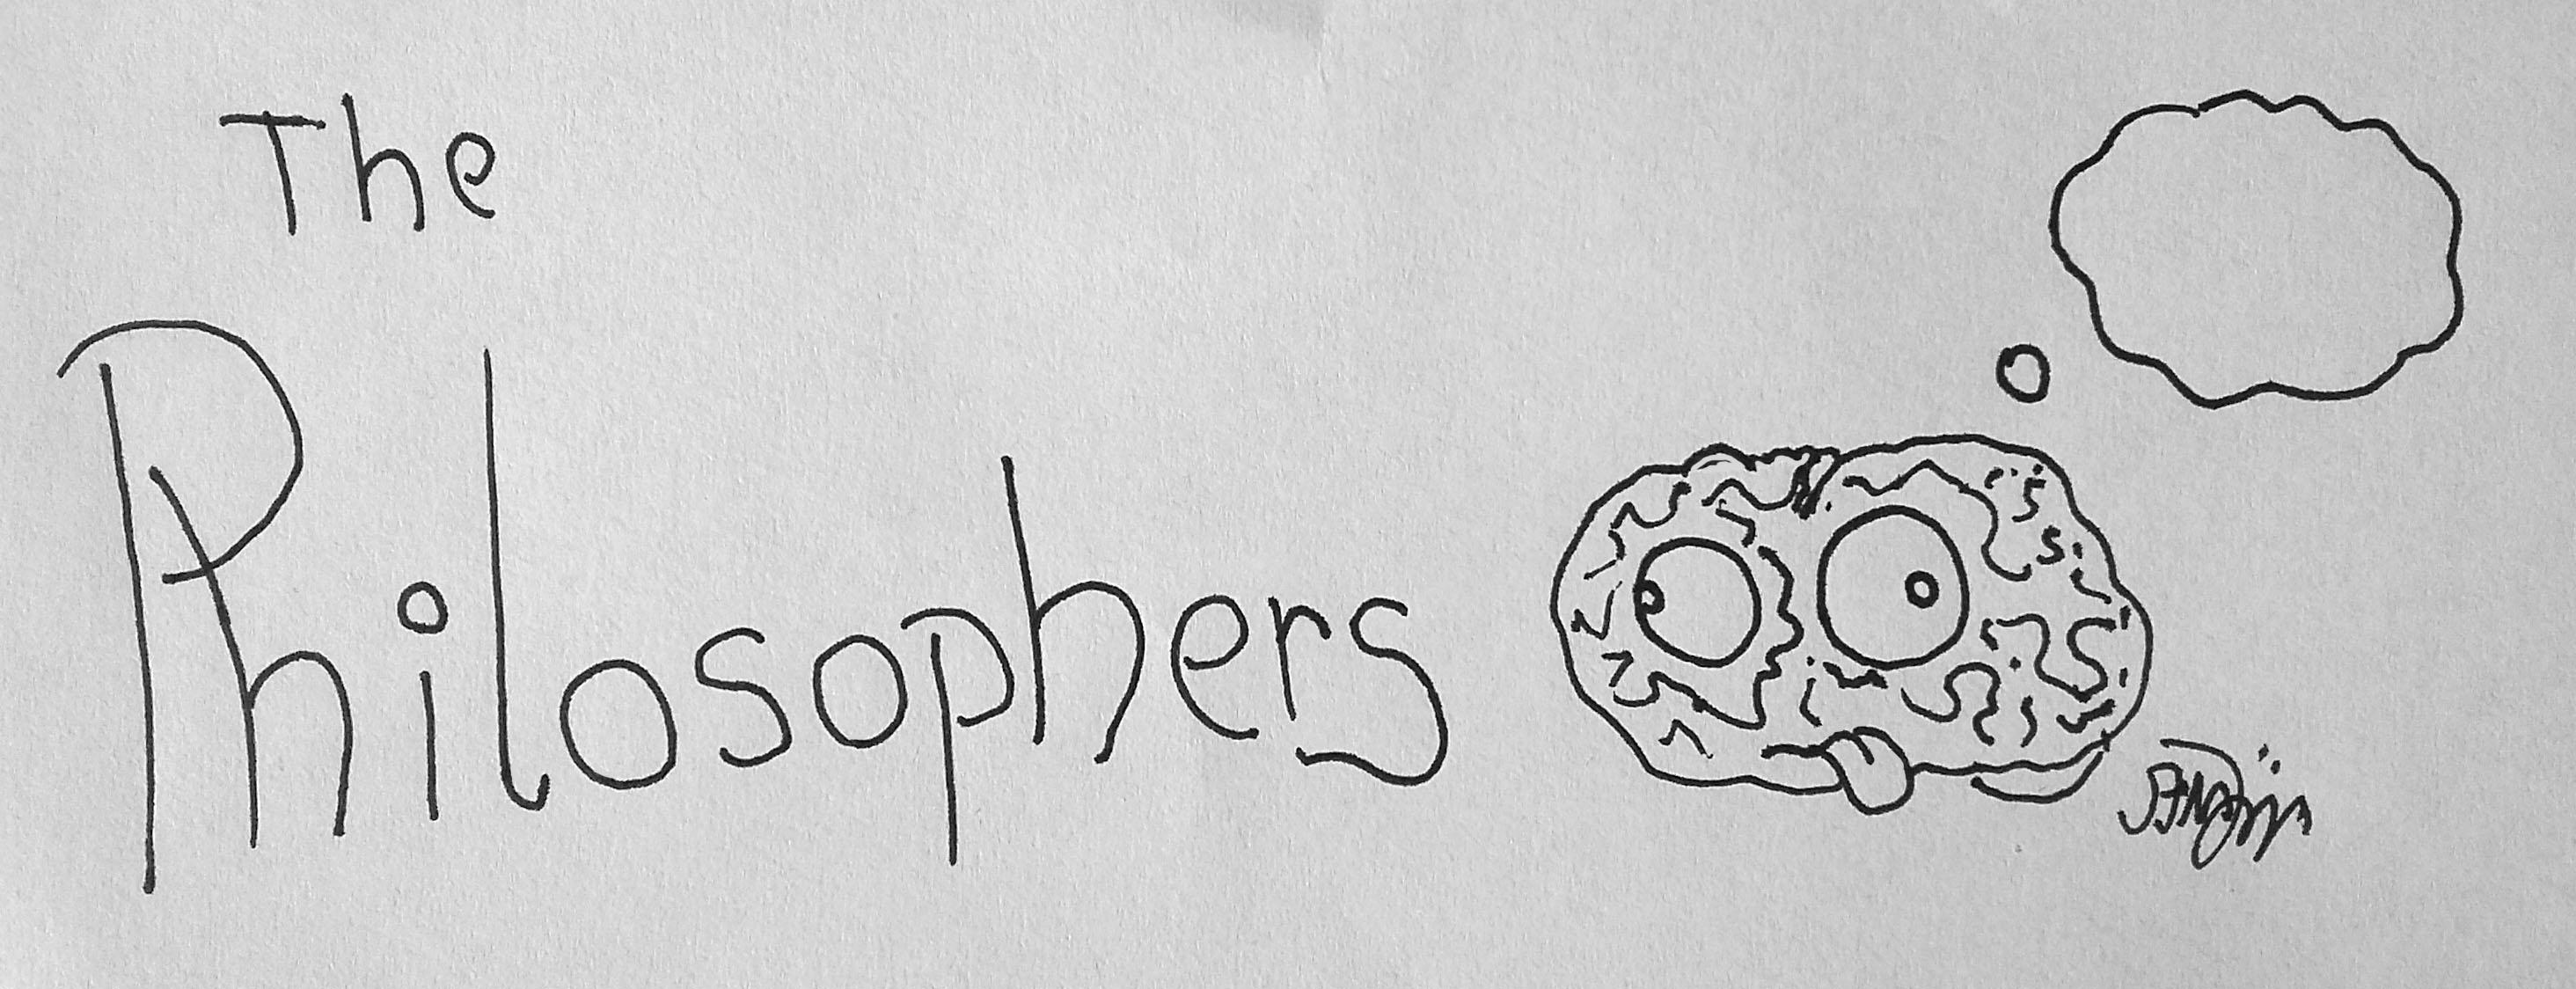 Titel The Philosophers